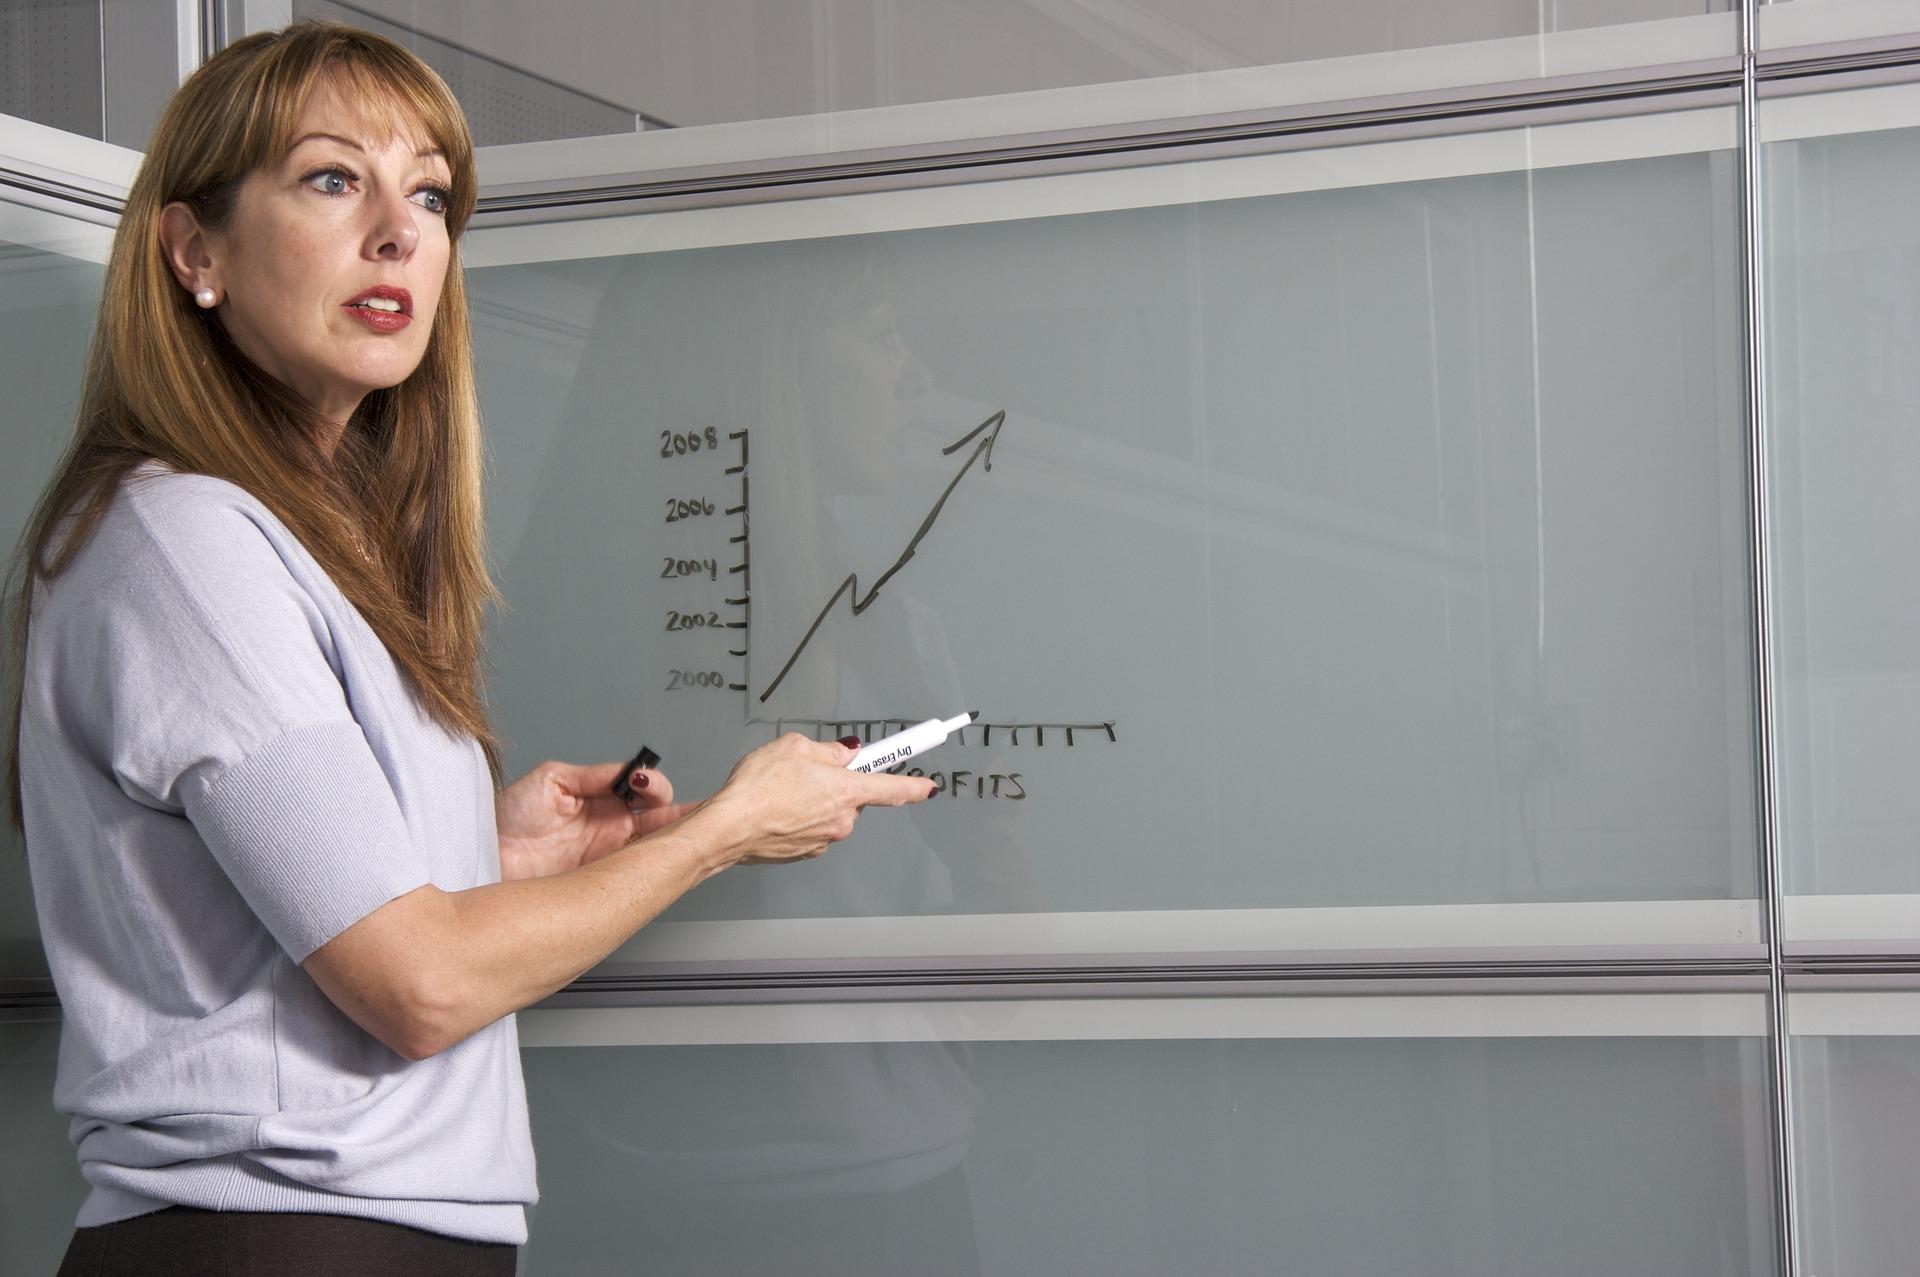 Iščemo učitelje za poučevanje v programu Osnovne šole za odrasle